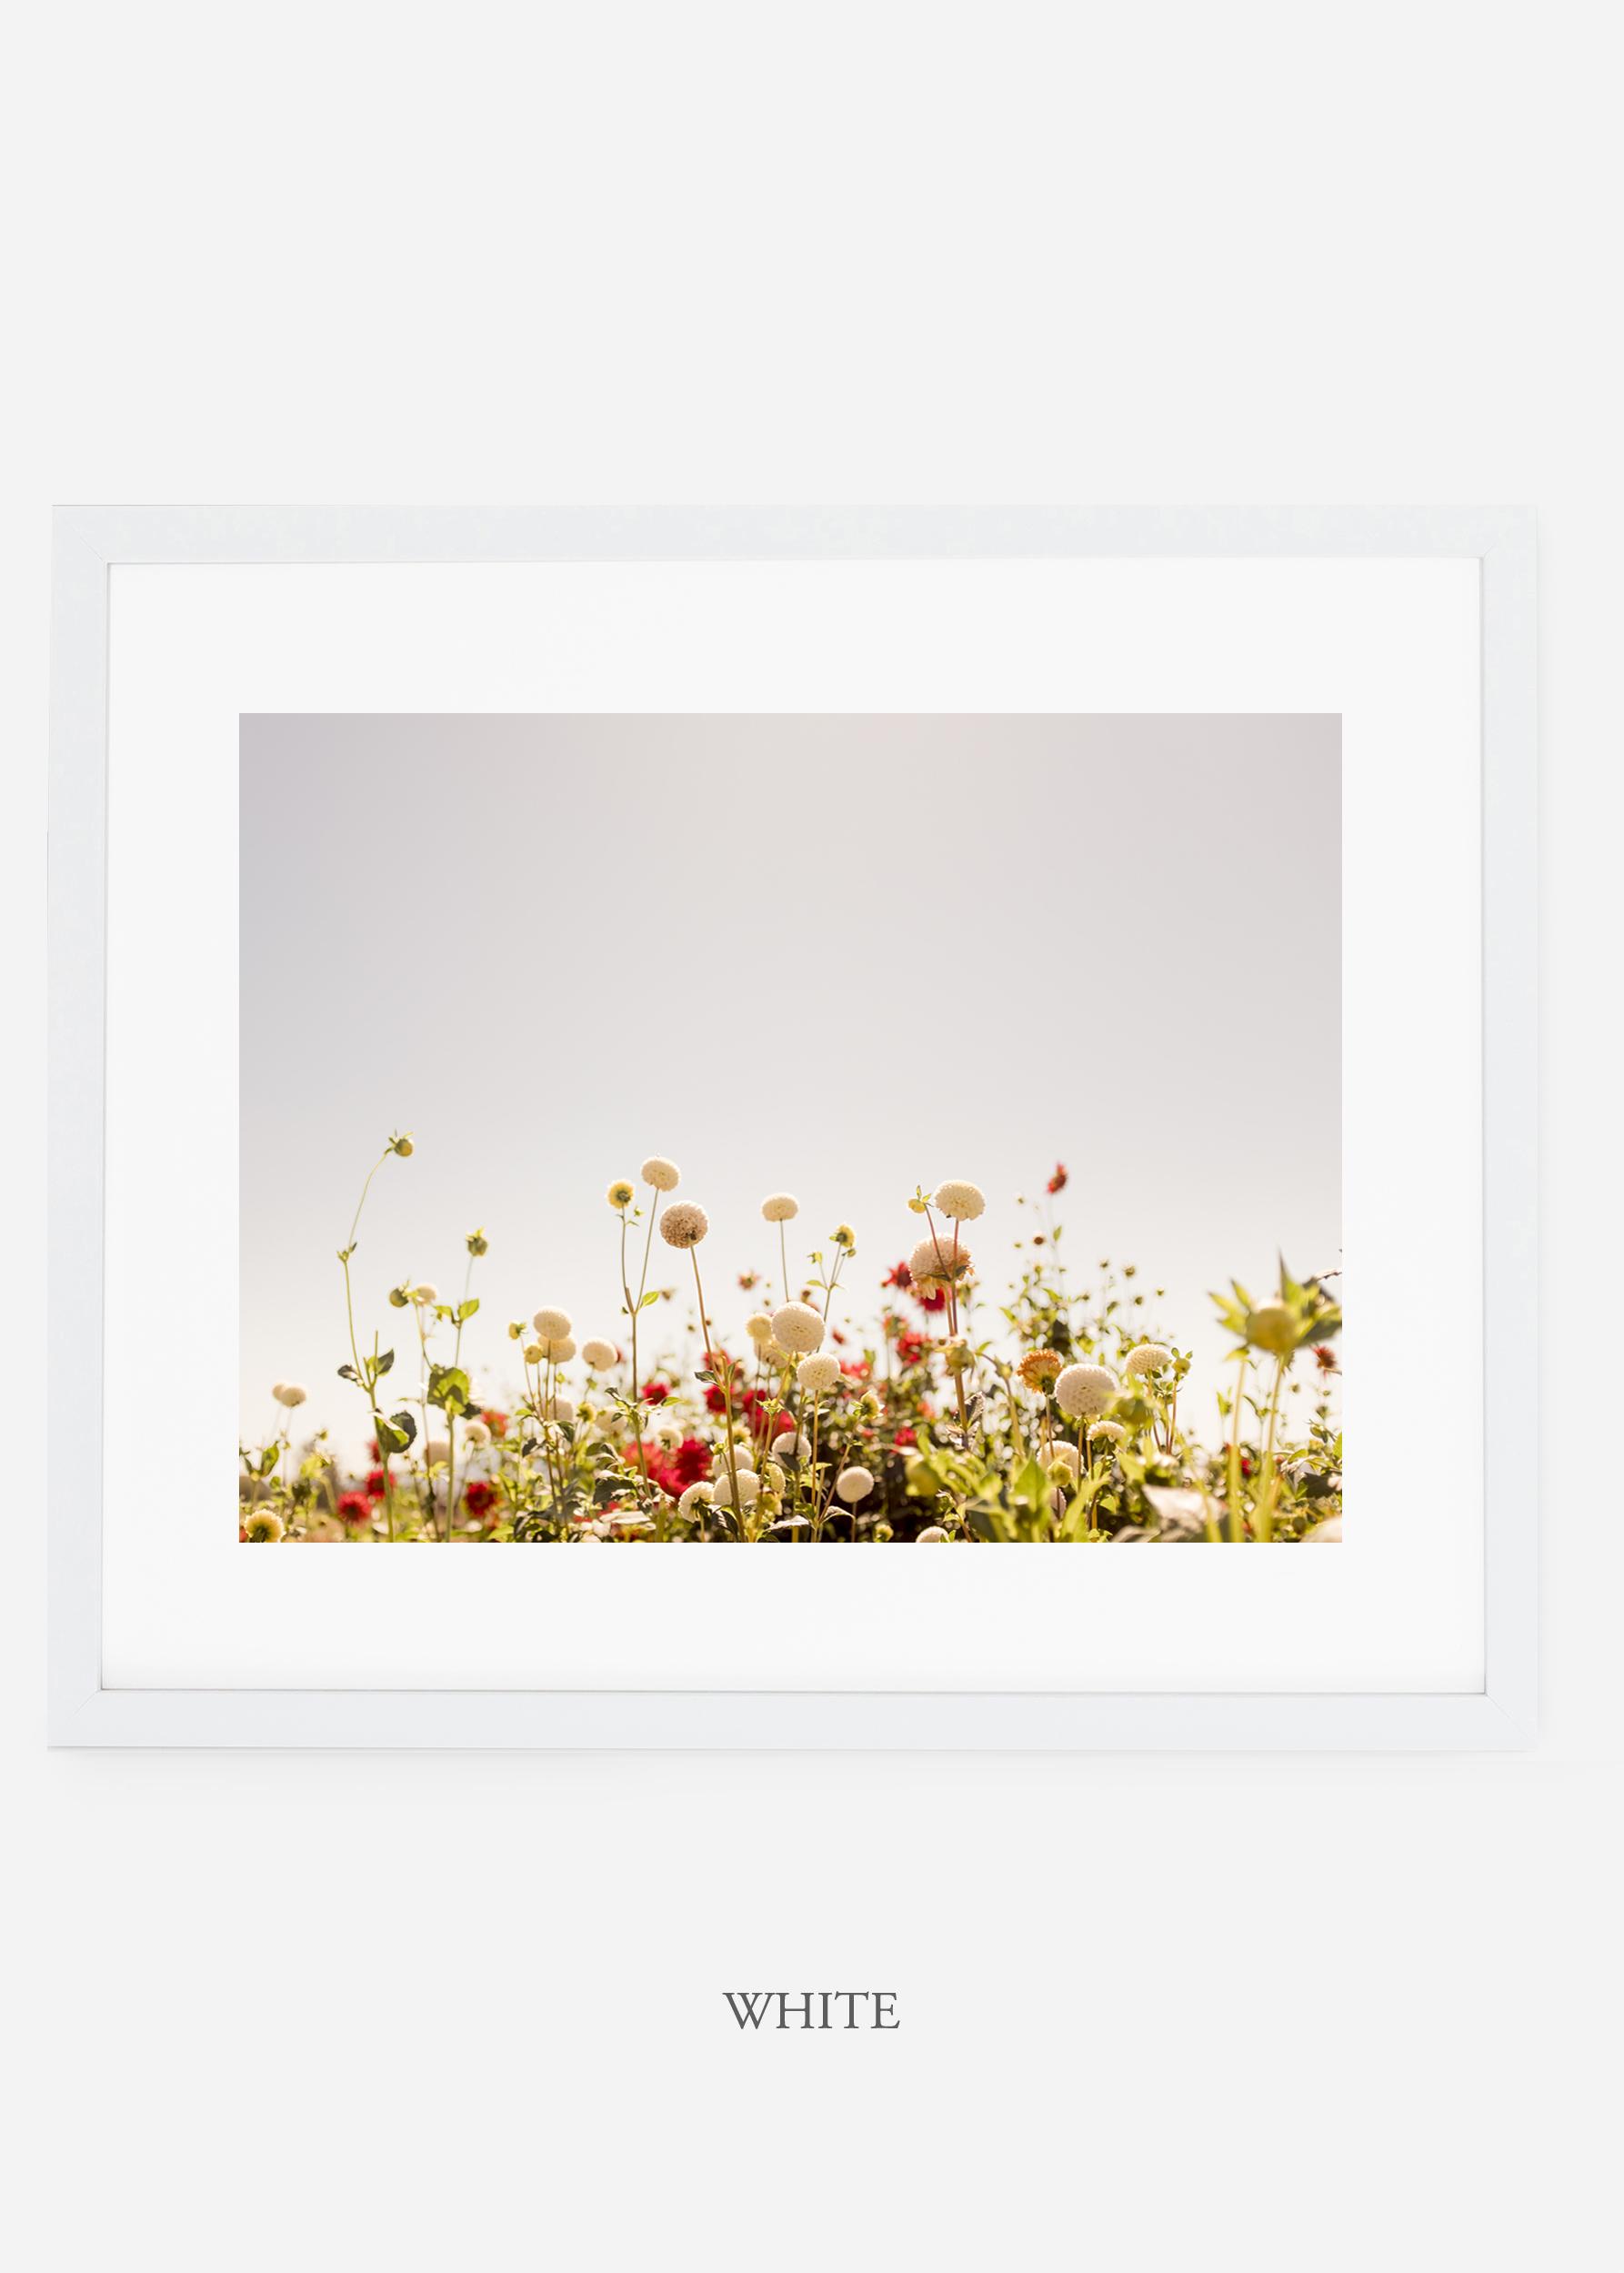 wilder-california-whiteframe-dahlia-5-minimal-botanical-print-art-interior-design.jpg